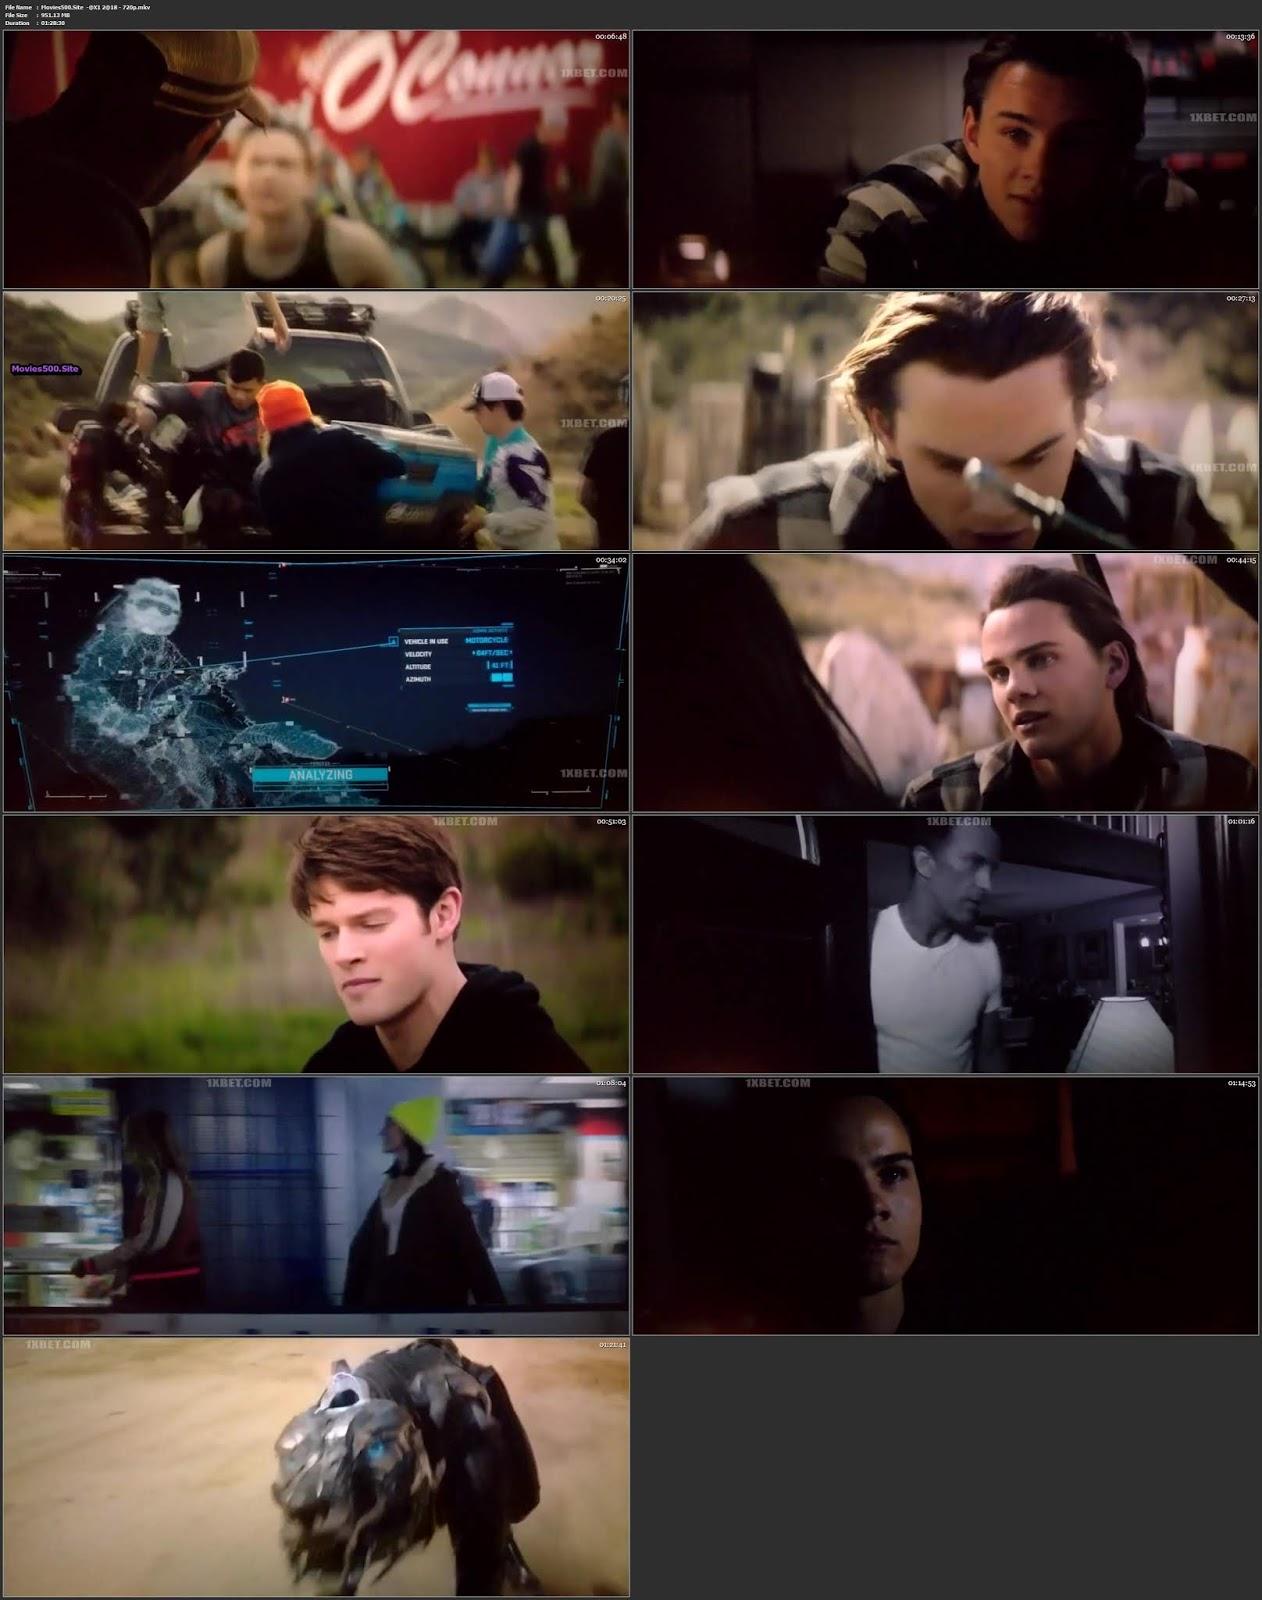 Axl Movie 2018 a-x-l 2018 english full movie hdcam 720p download - movies500